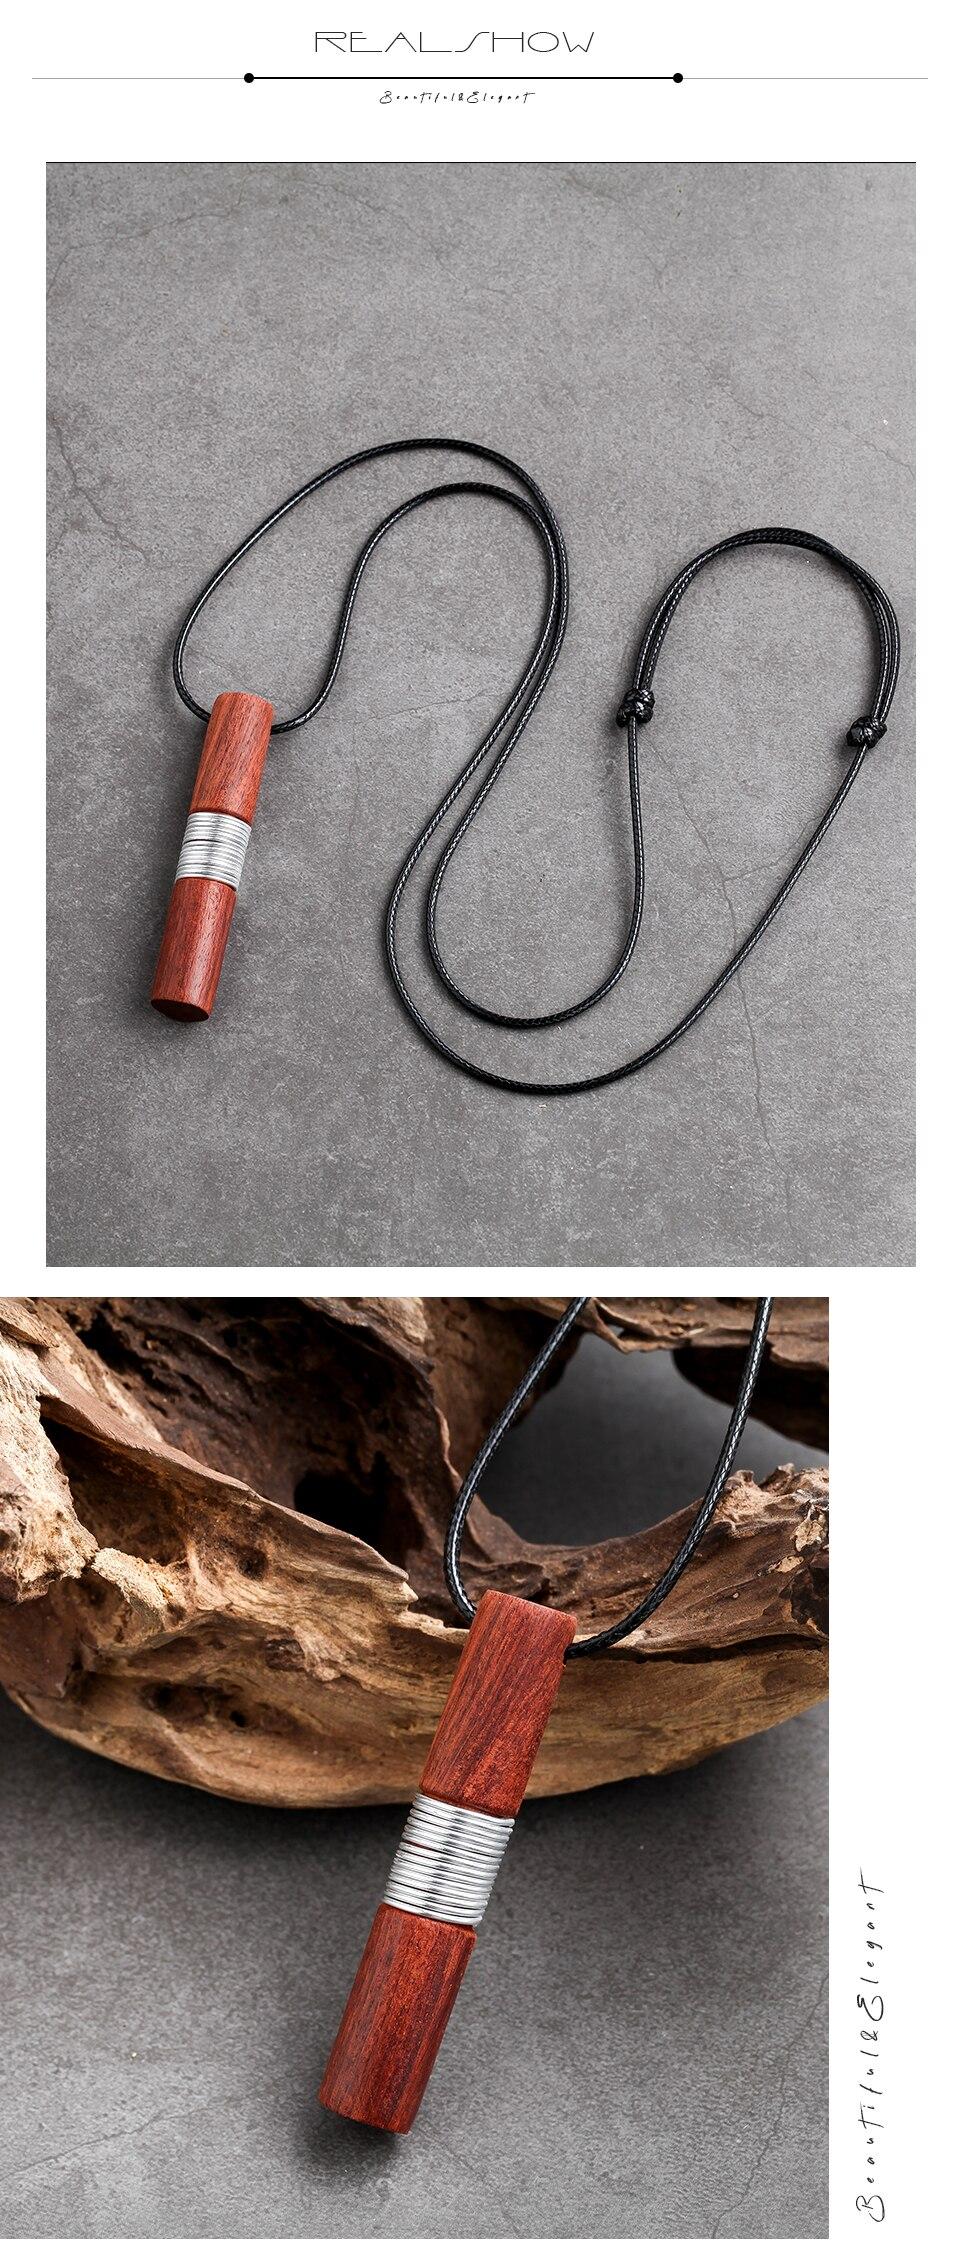 Women Necklaces Zinc Alloy Handmade Red Sandalwood Pendant & Necklaces Sweater Chain Geometric Unique Pendant For Friends Gift